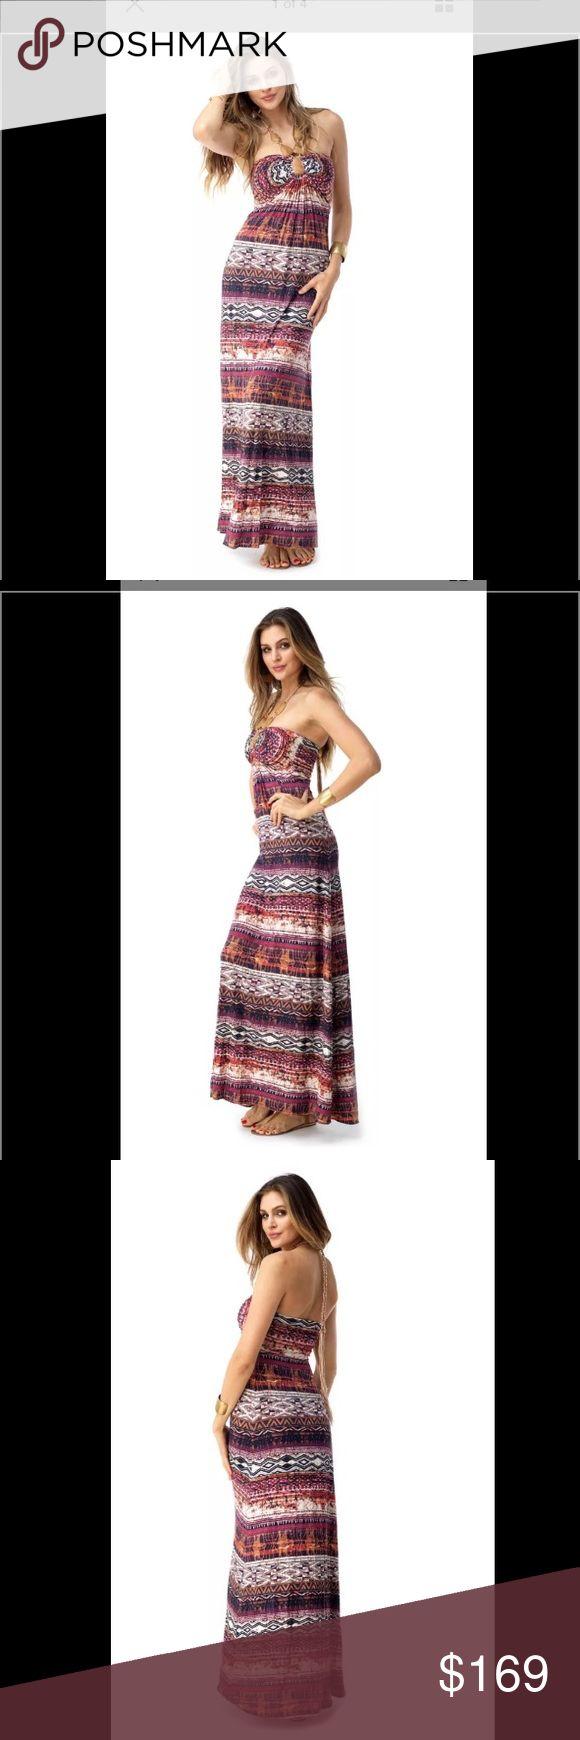 Sky brand maxi dress sale